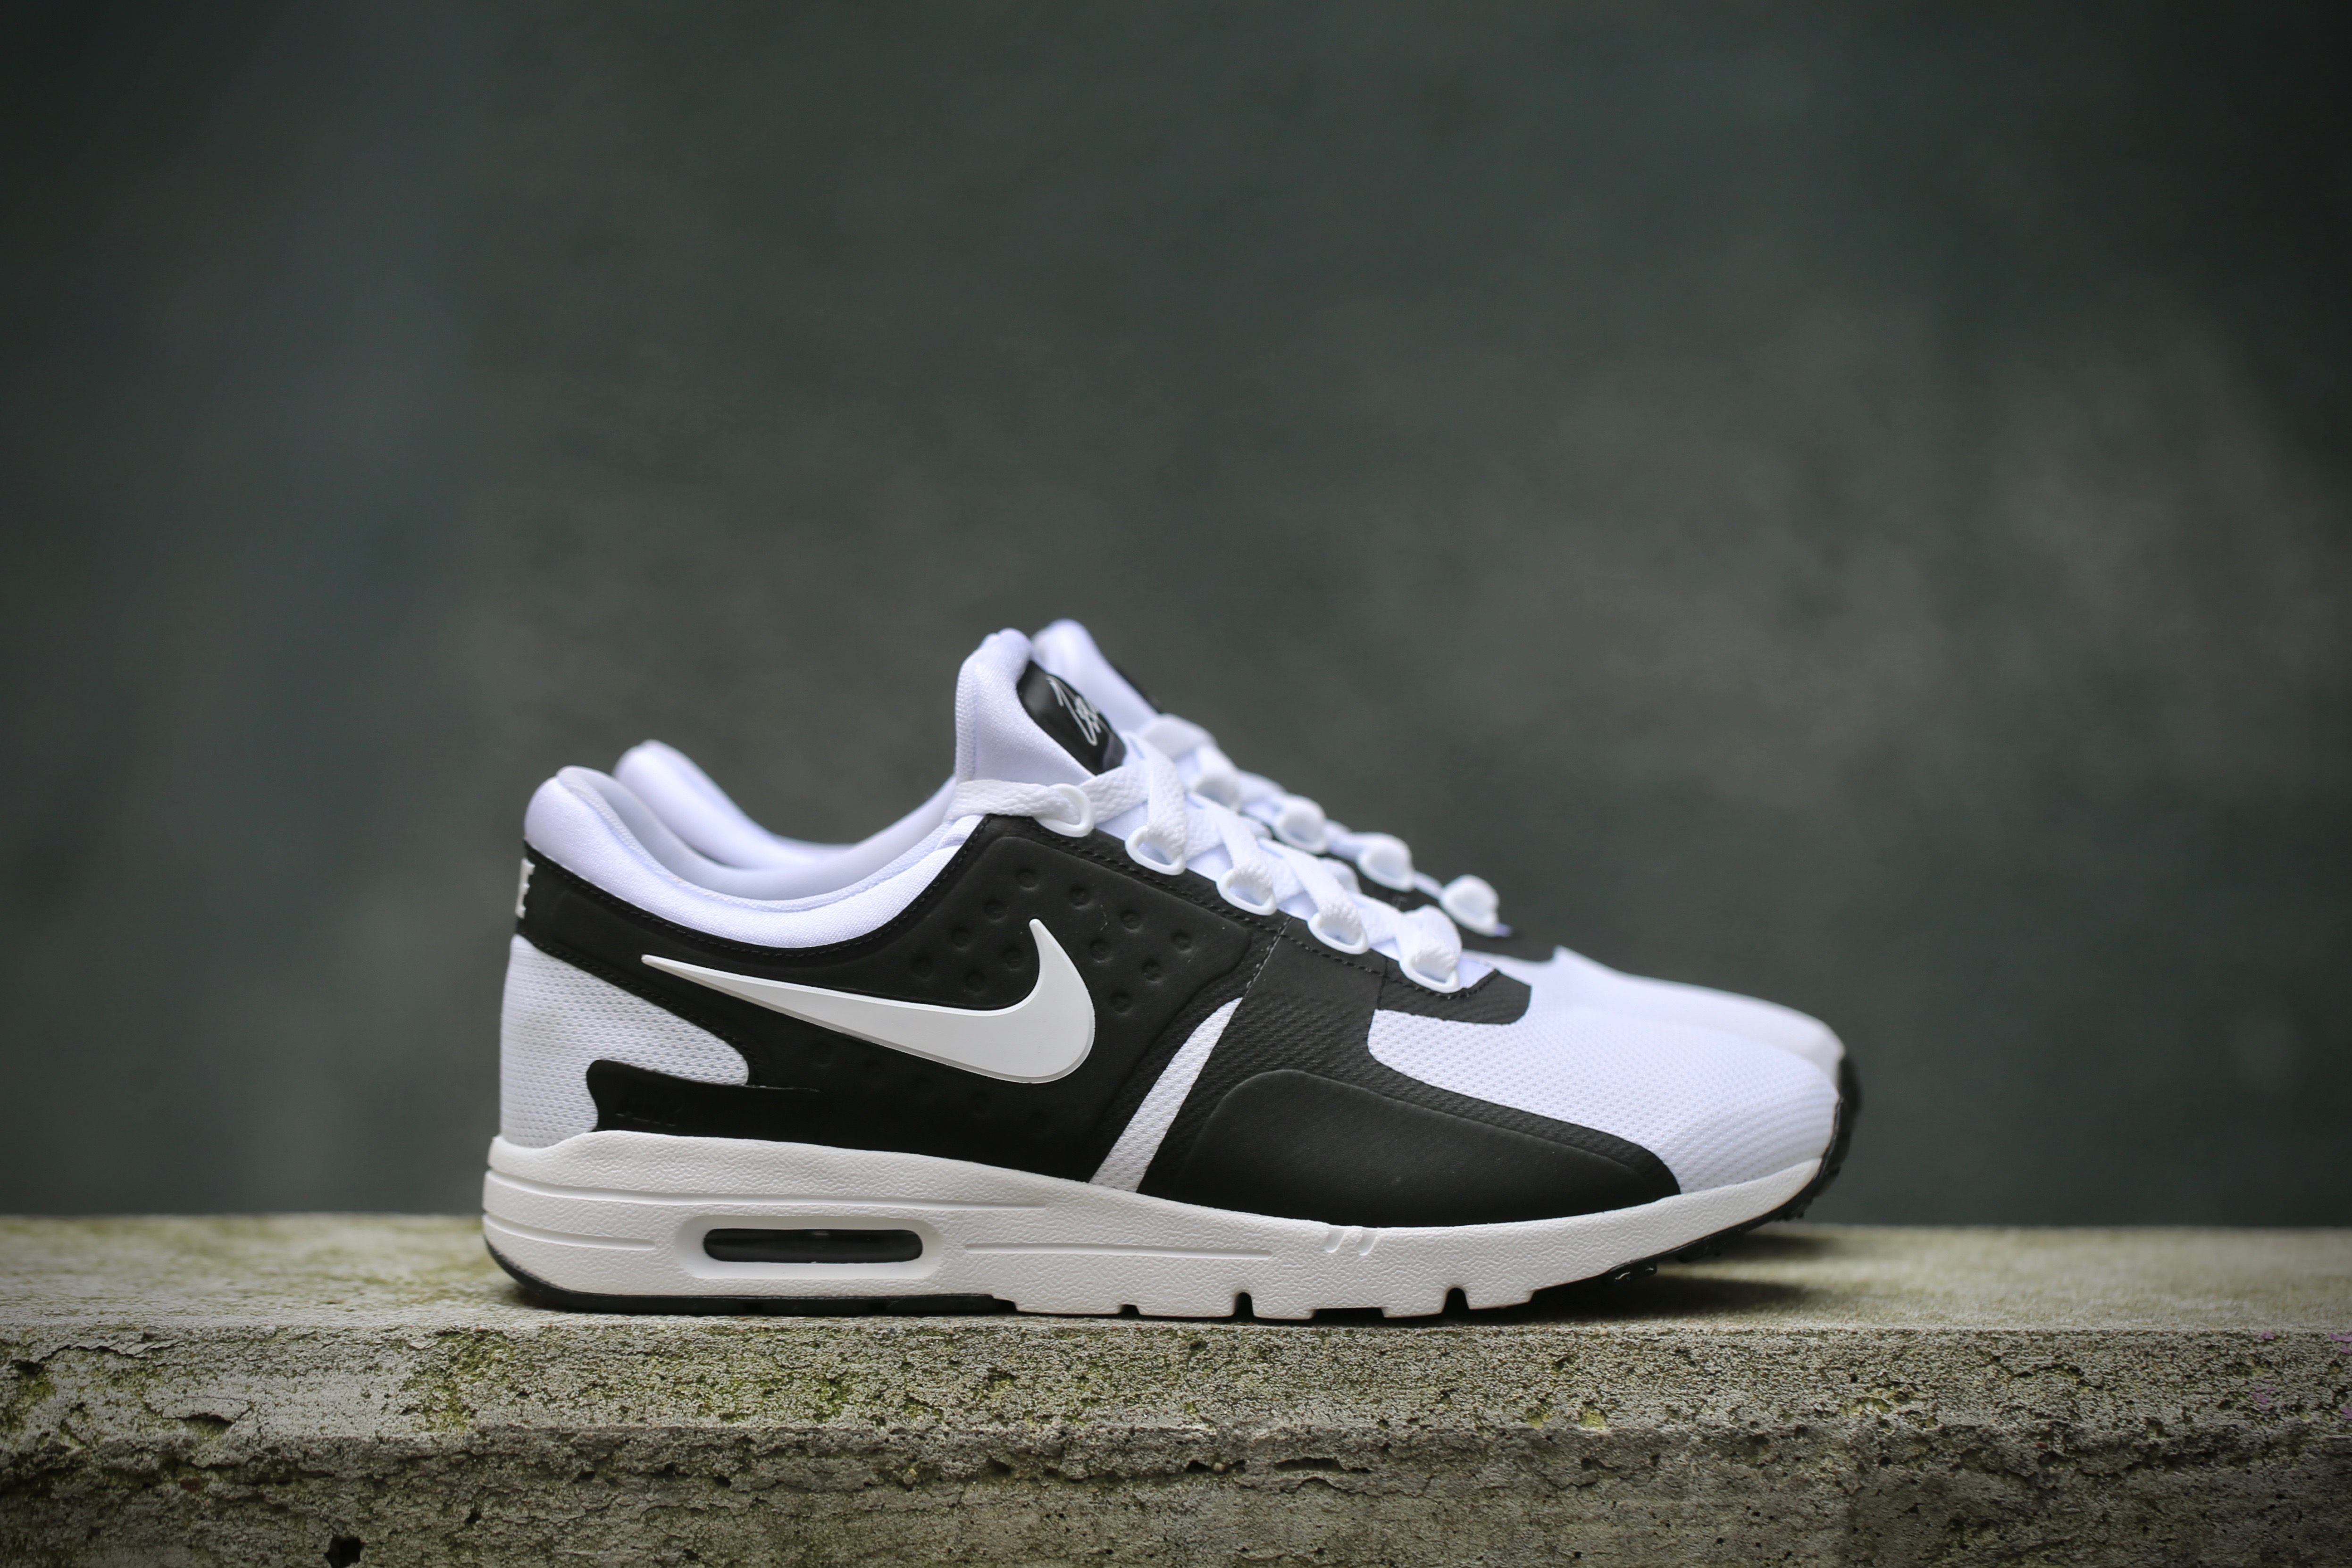 new style 97d35 1266a Nike W Air Max Zero - Black / White